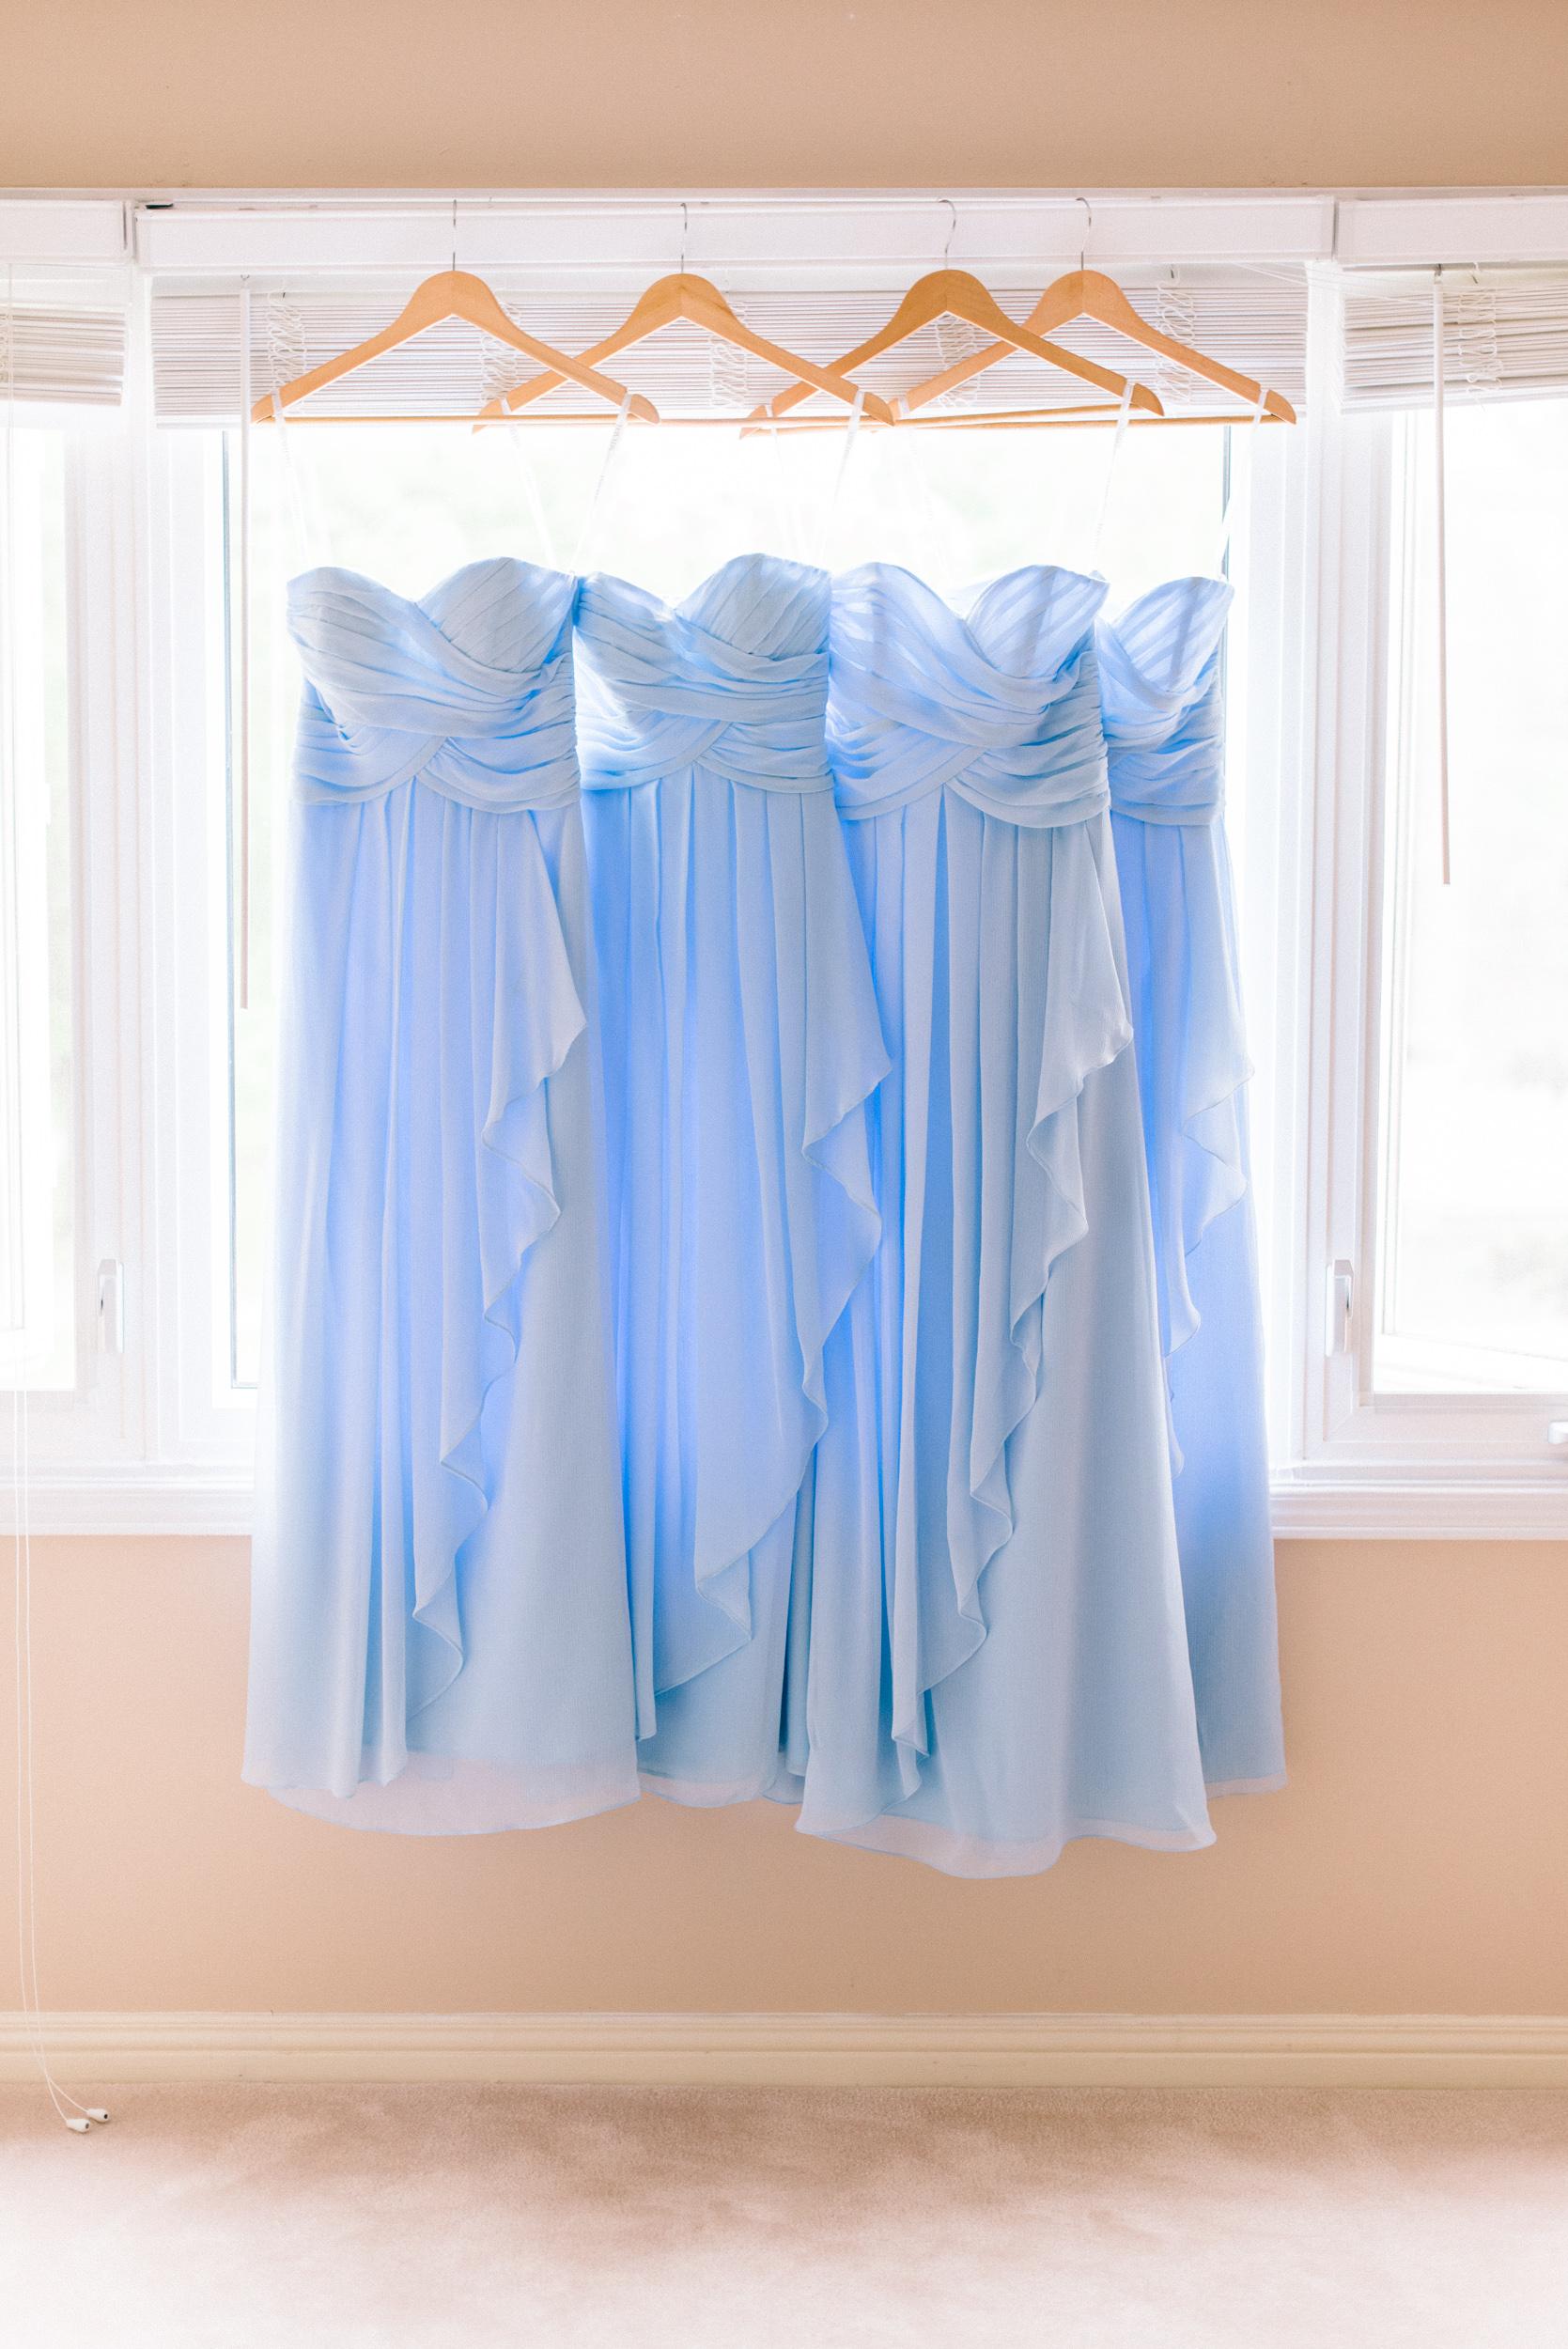 knox-college-wedding-9.jpg